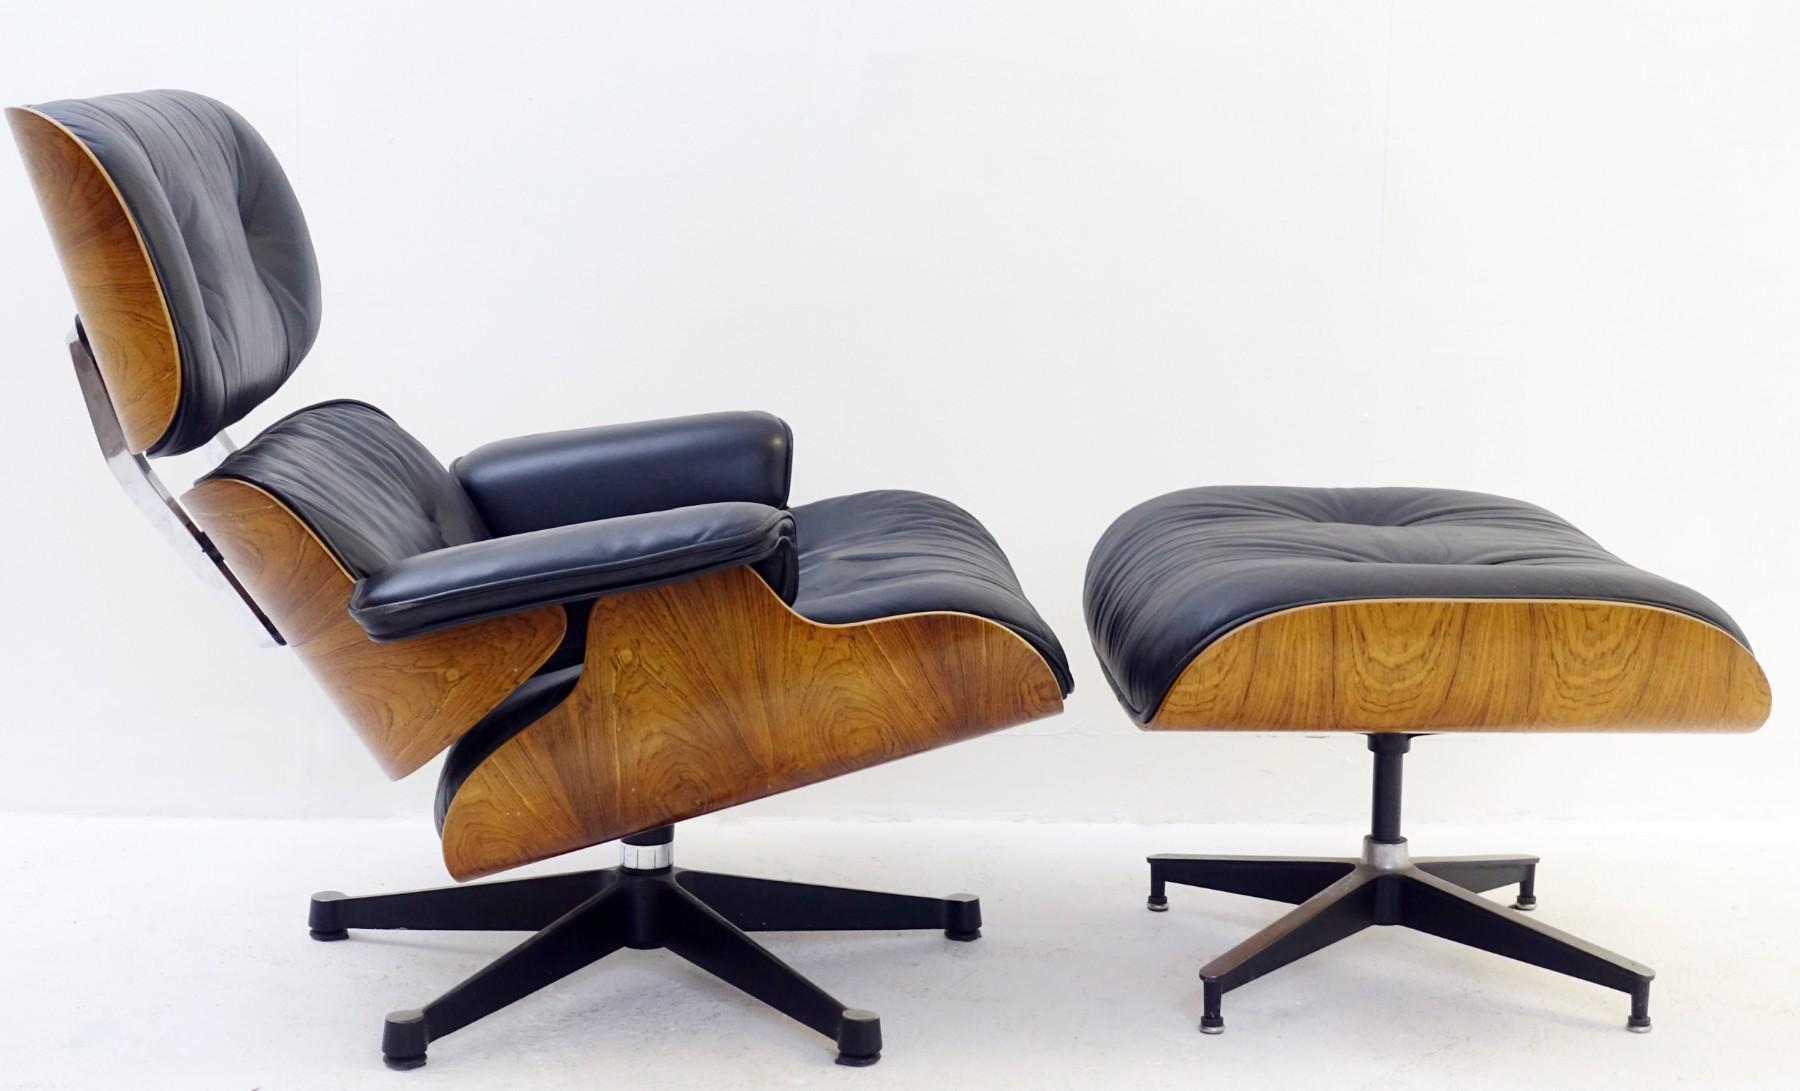 Peachy Eames Lounge Chair Ottoman Via Antica Recent Added Alphanode Cool Chair Designs And Ideas Alphanodeonline